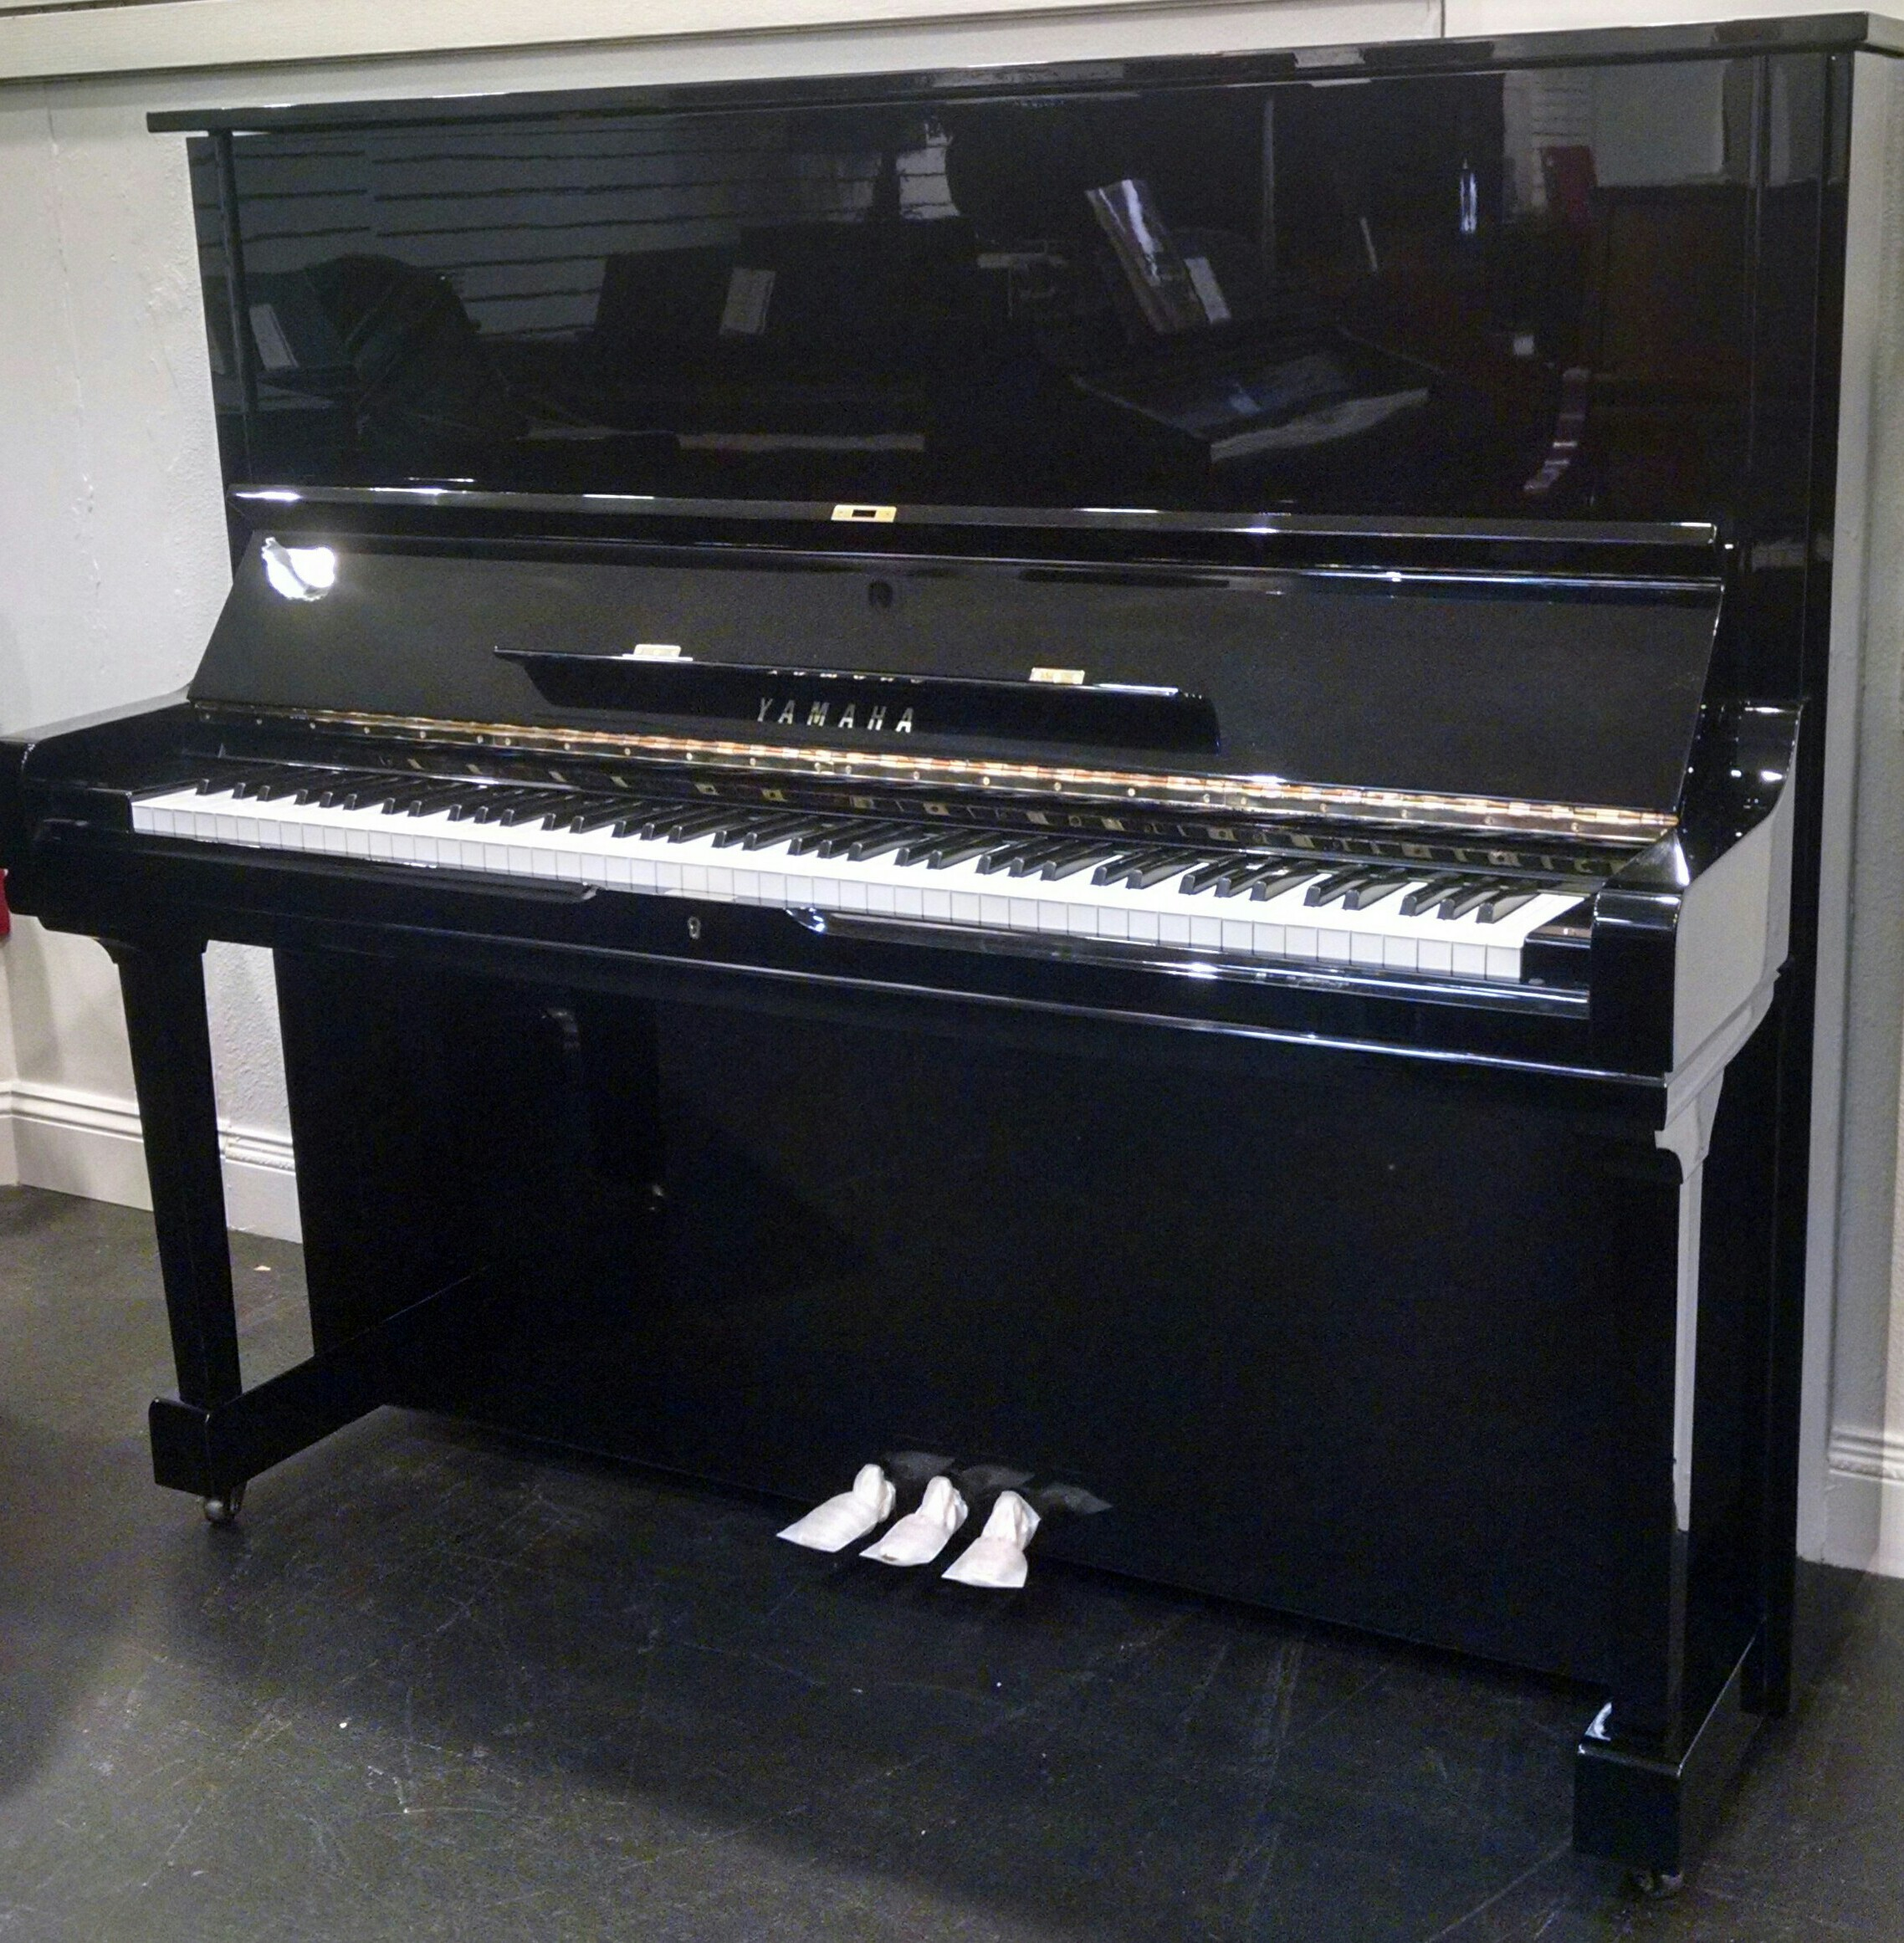 Yamaha u3 52 professional upright piano 5999 piano expo for New yamaha u3 piano price